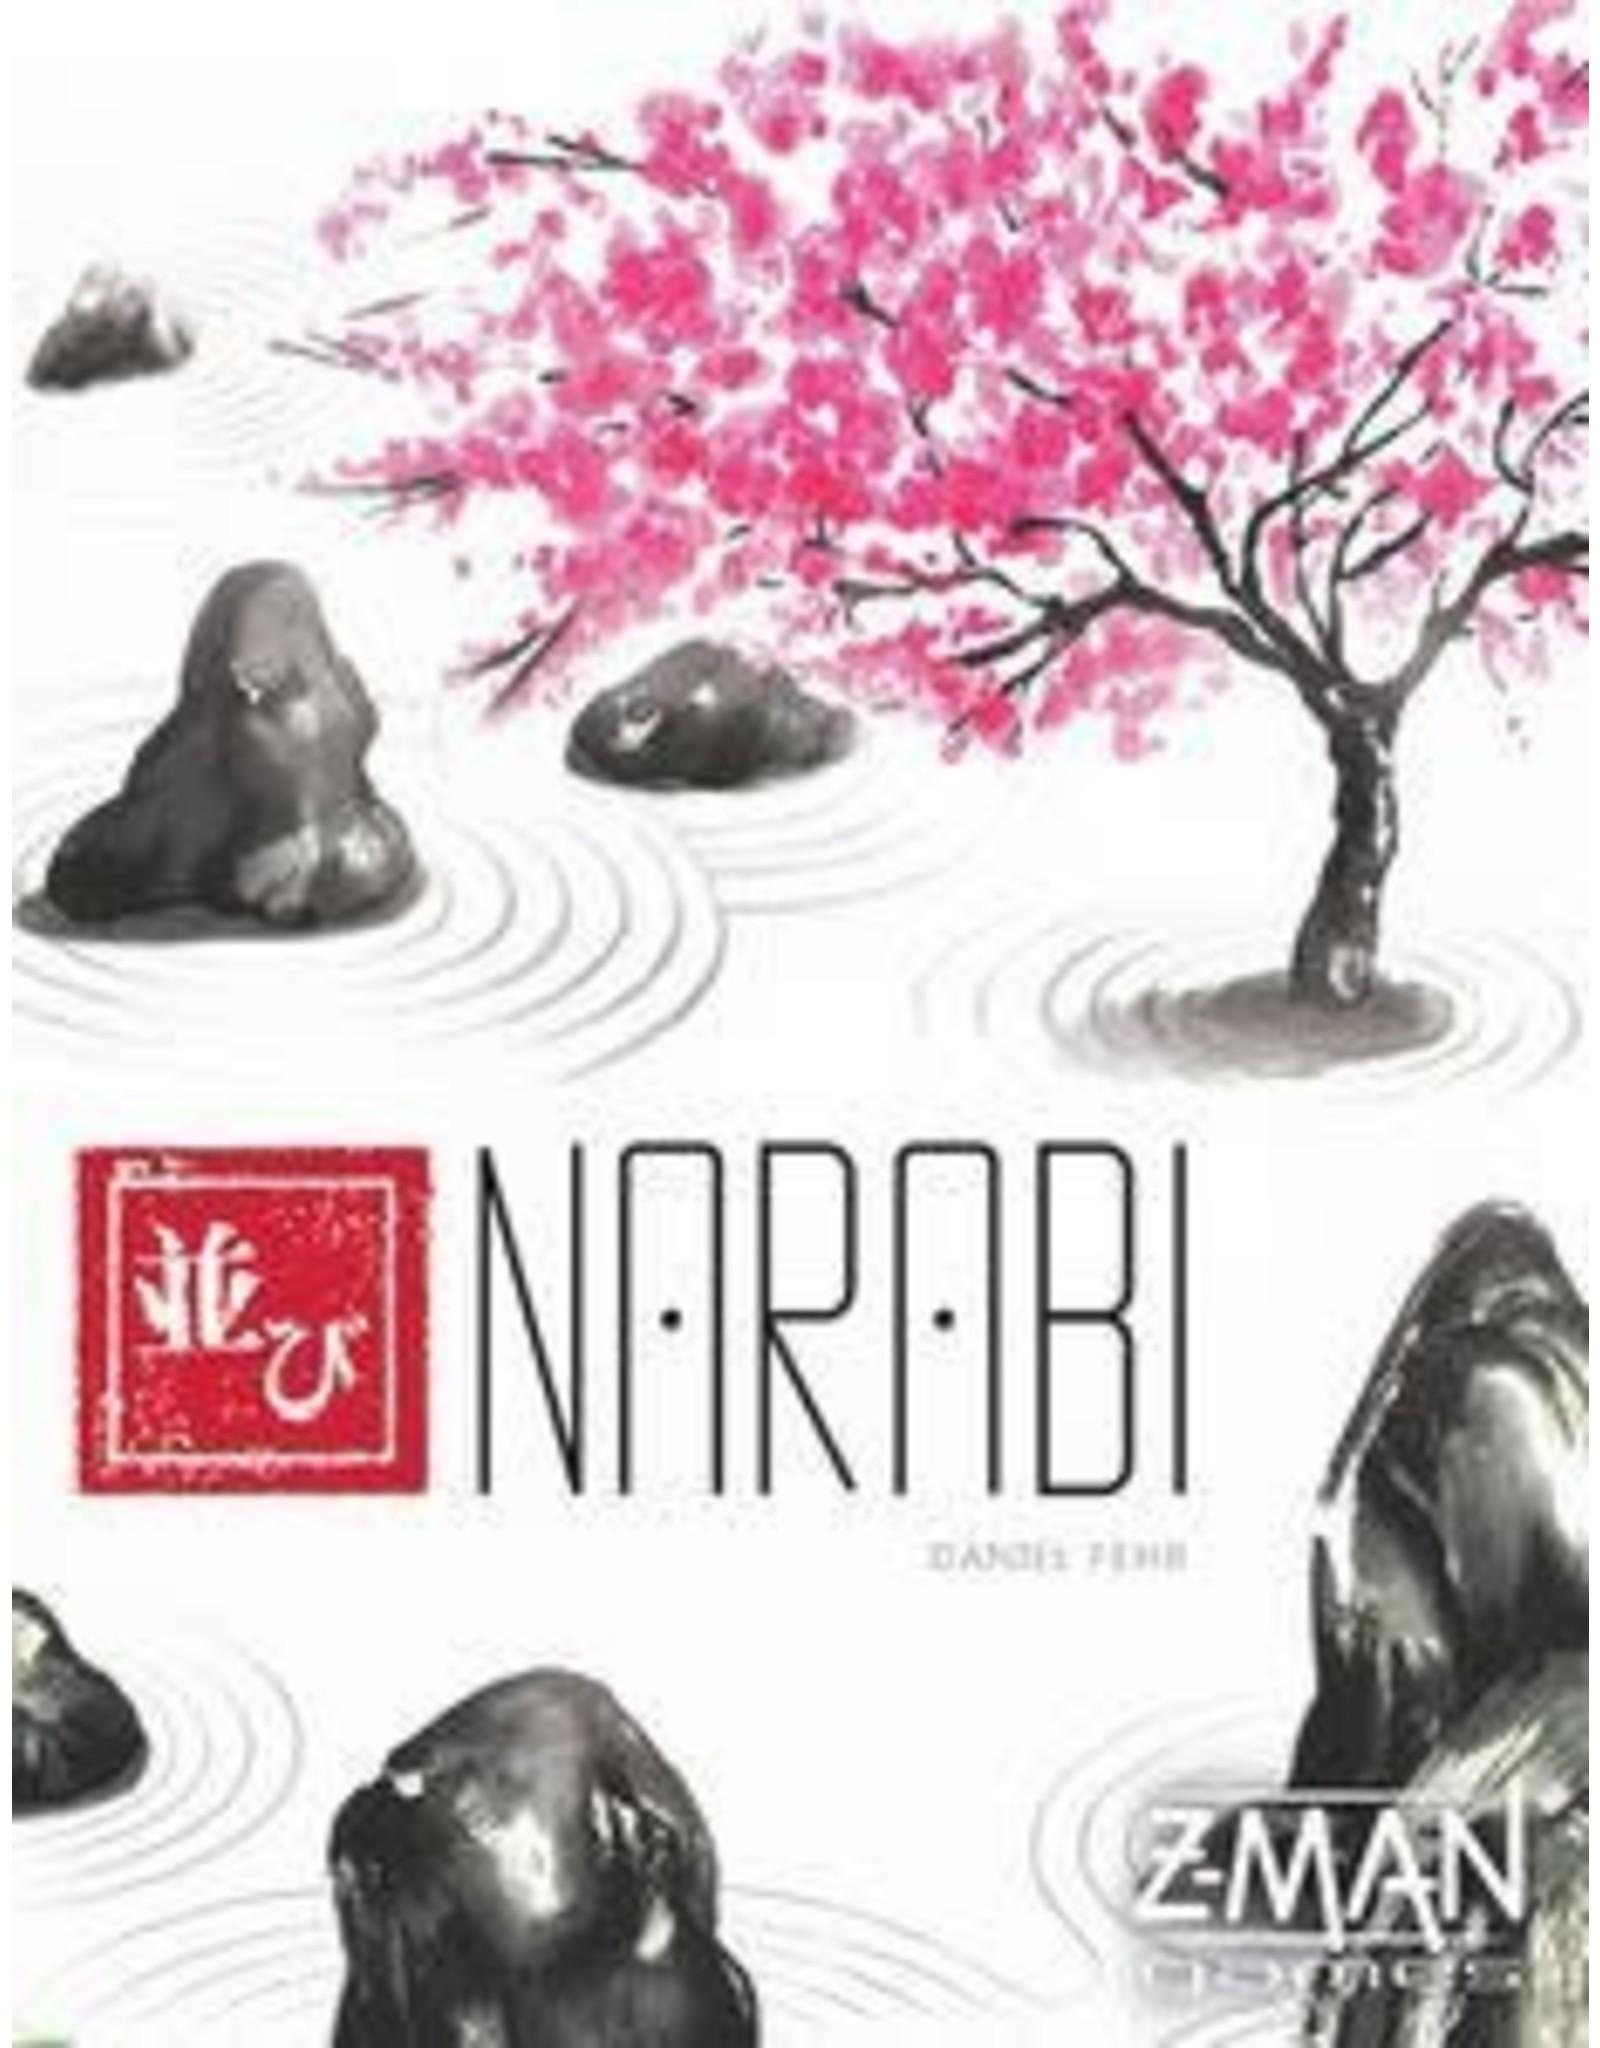 Narabi